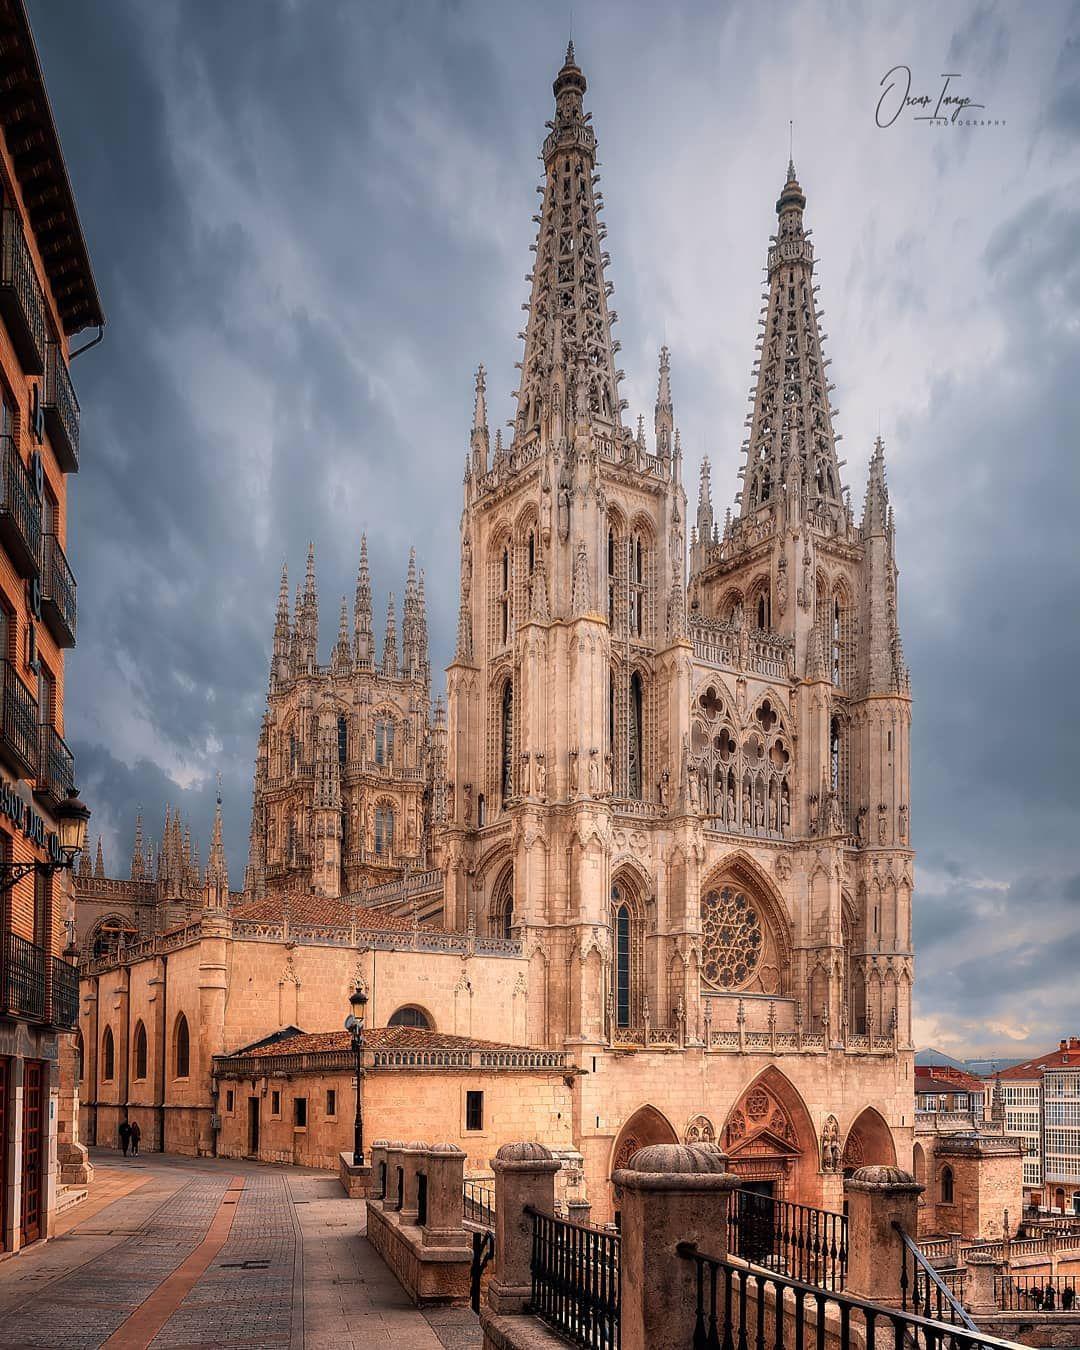 Burgos Cathedral Spain By Olmg2010 Lugares De Espana Catedral Gotica Catedral